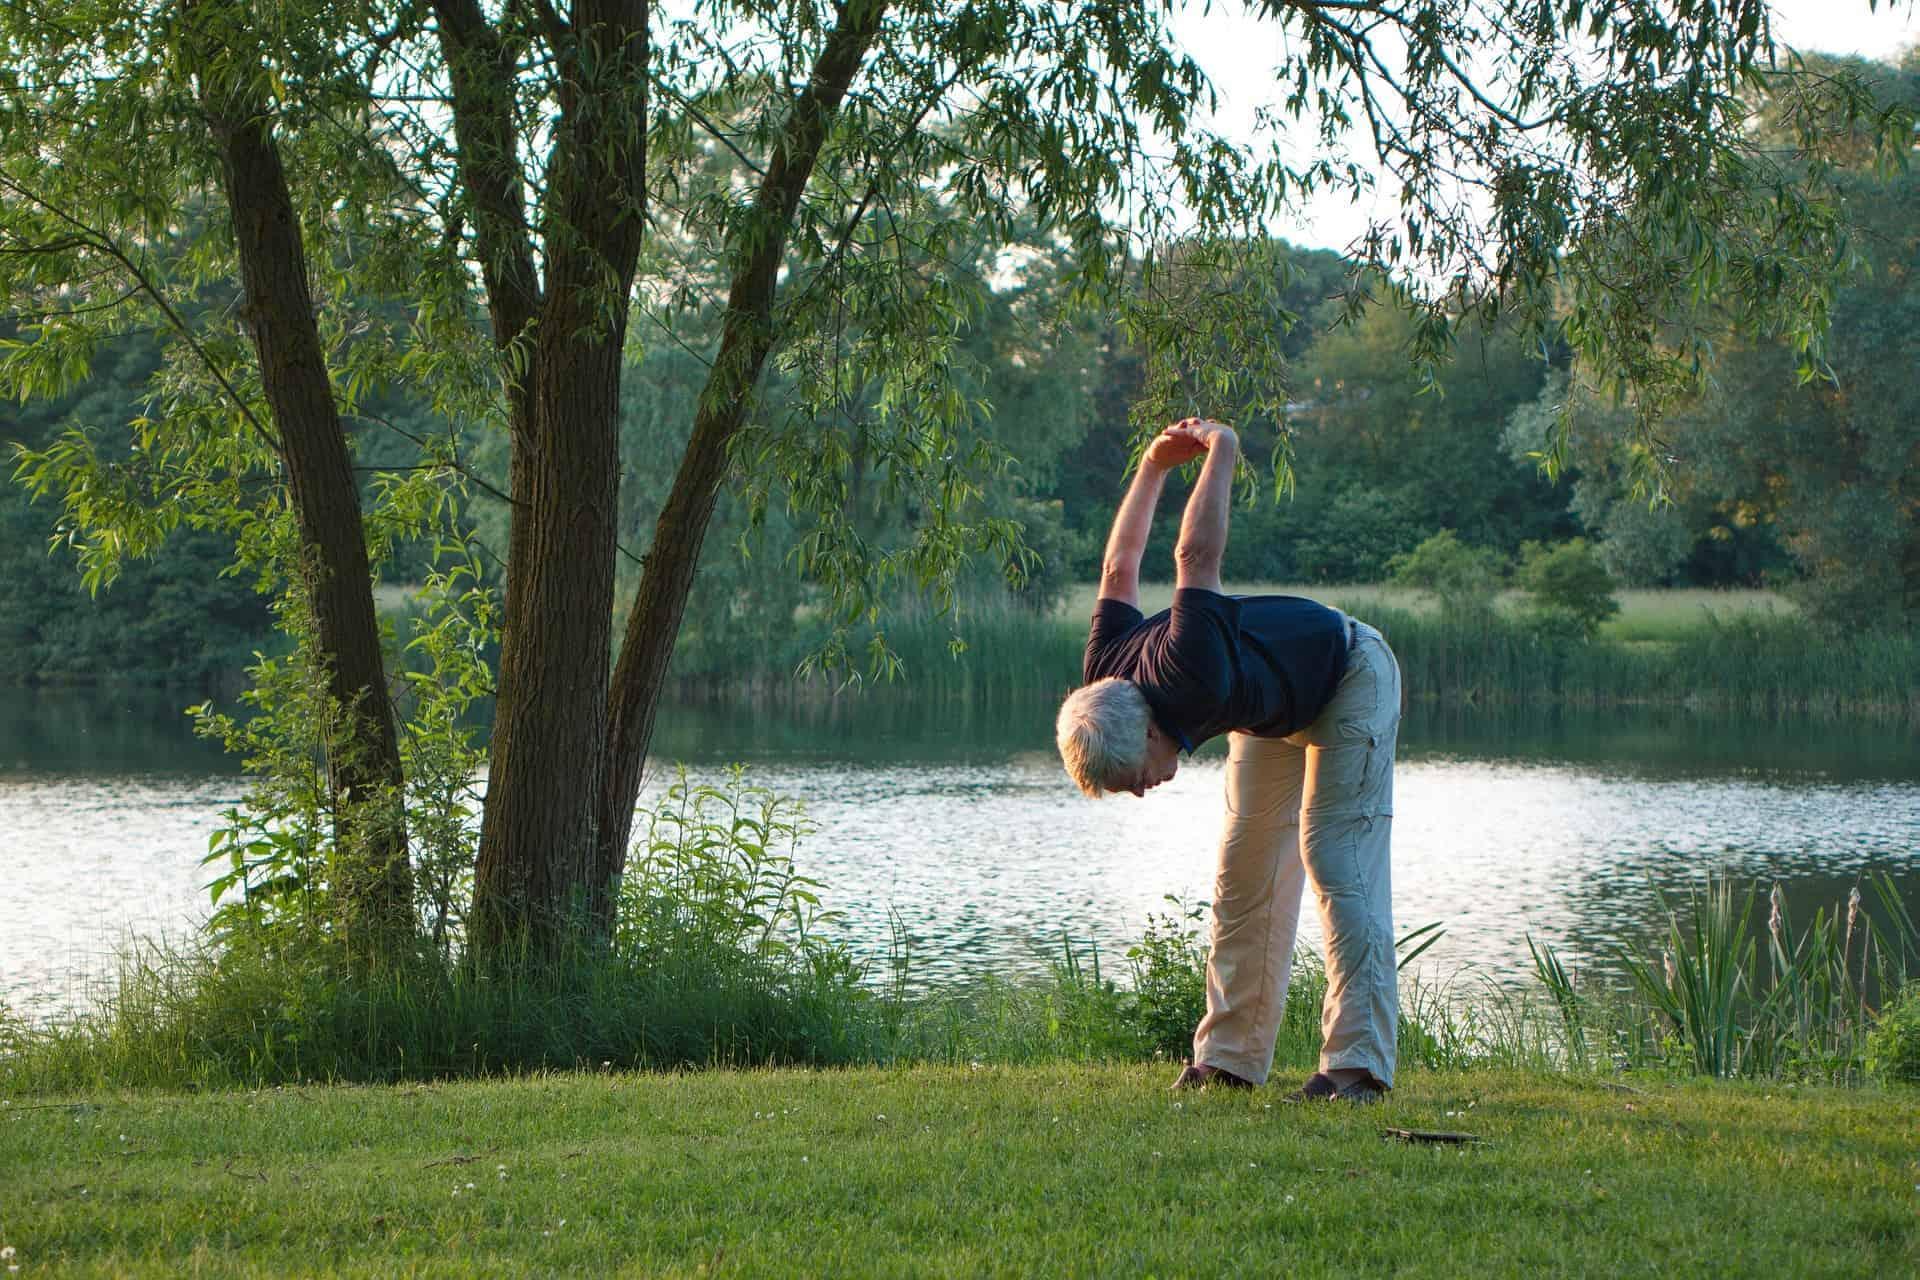 älterer Mann beim Ausdehnen nach dem Joggen an einem See